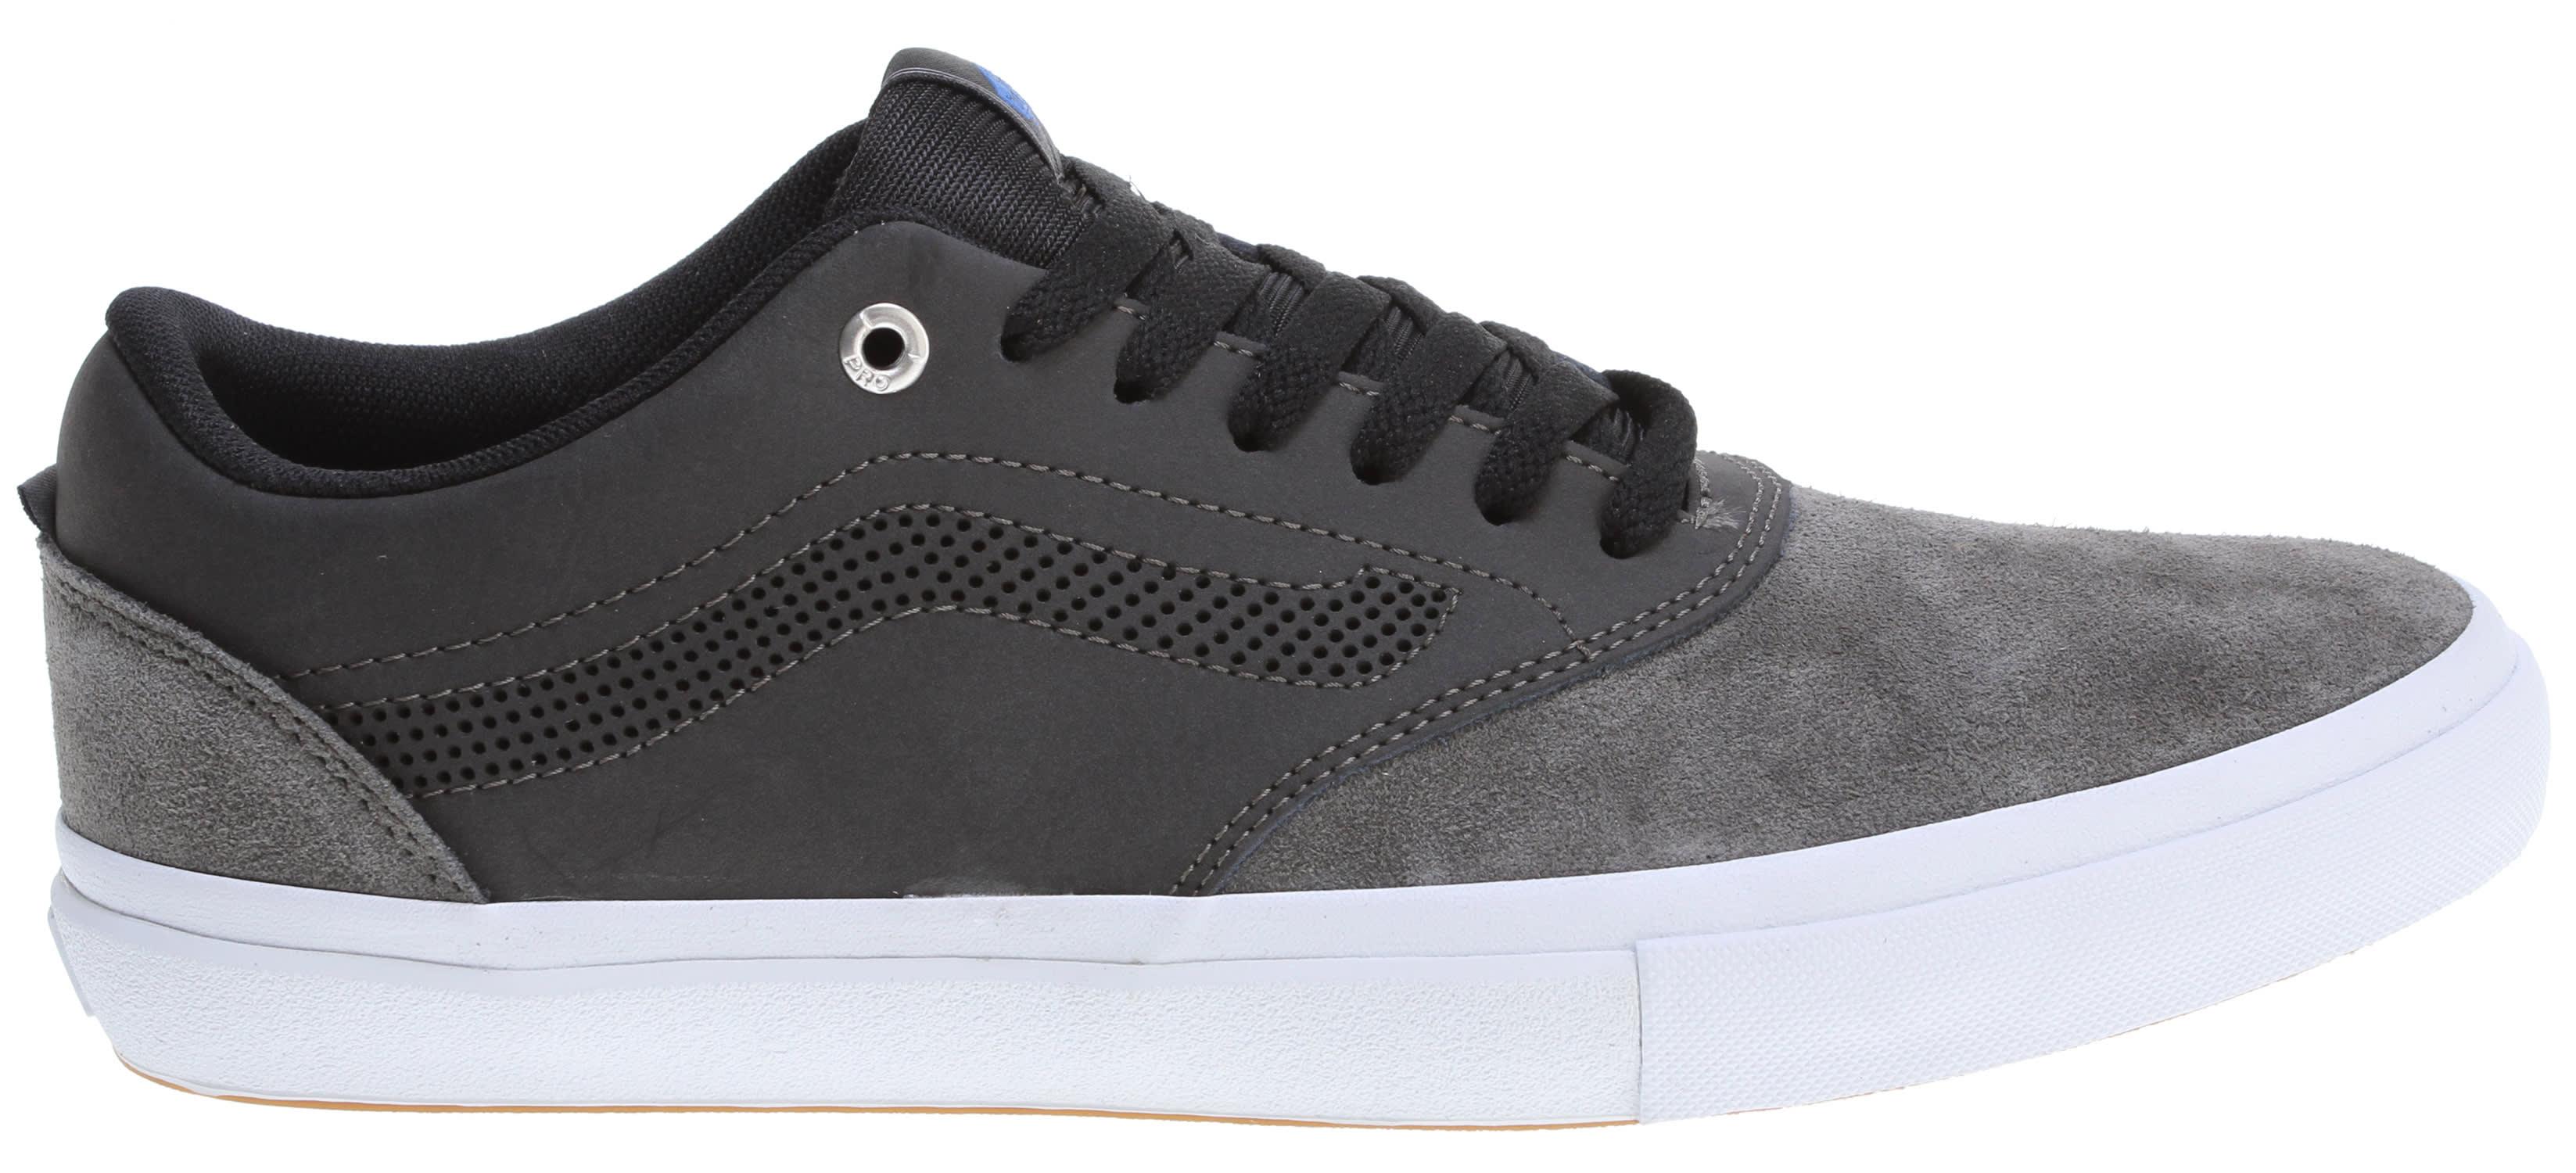 c0edac484c93 Vans Euclid Skate Shoes - thumbnail 1